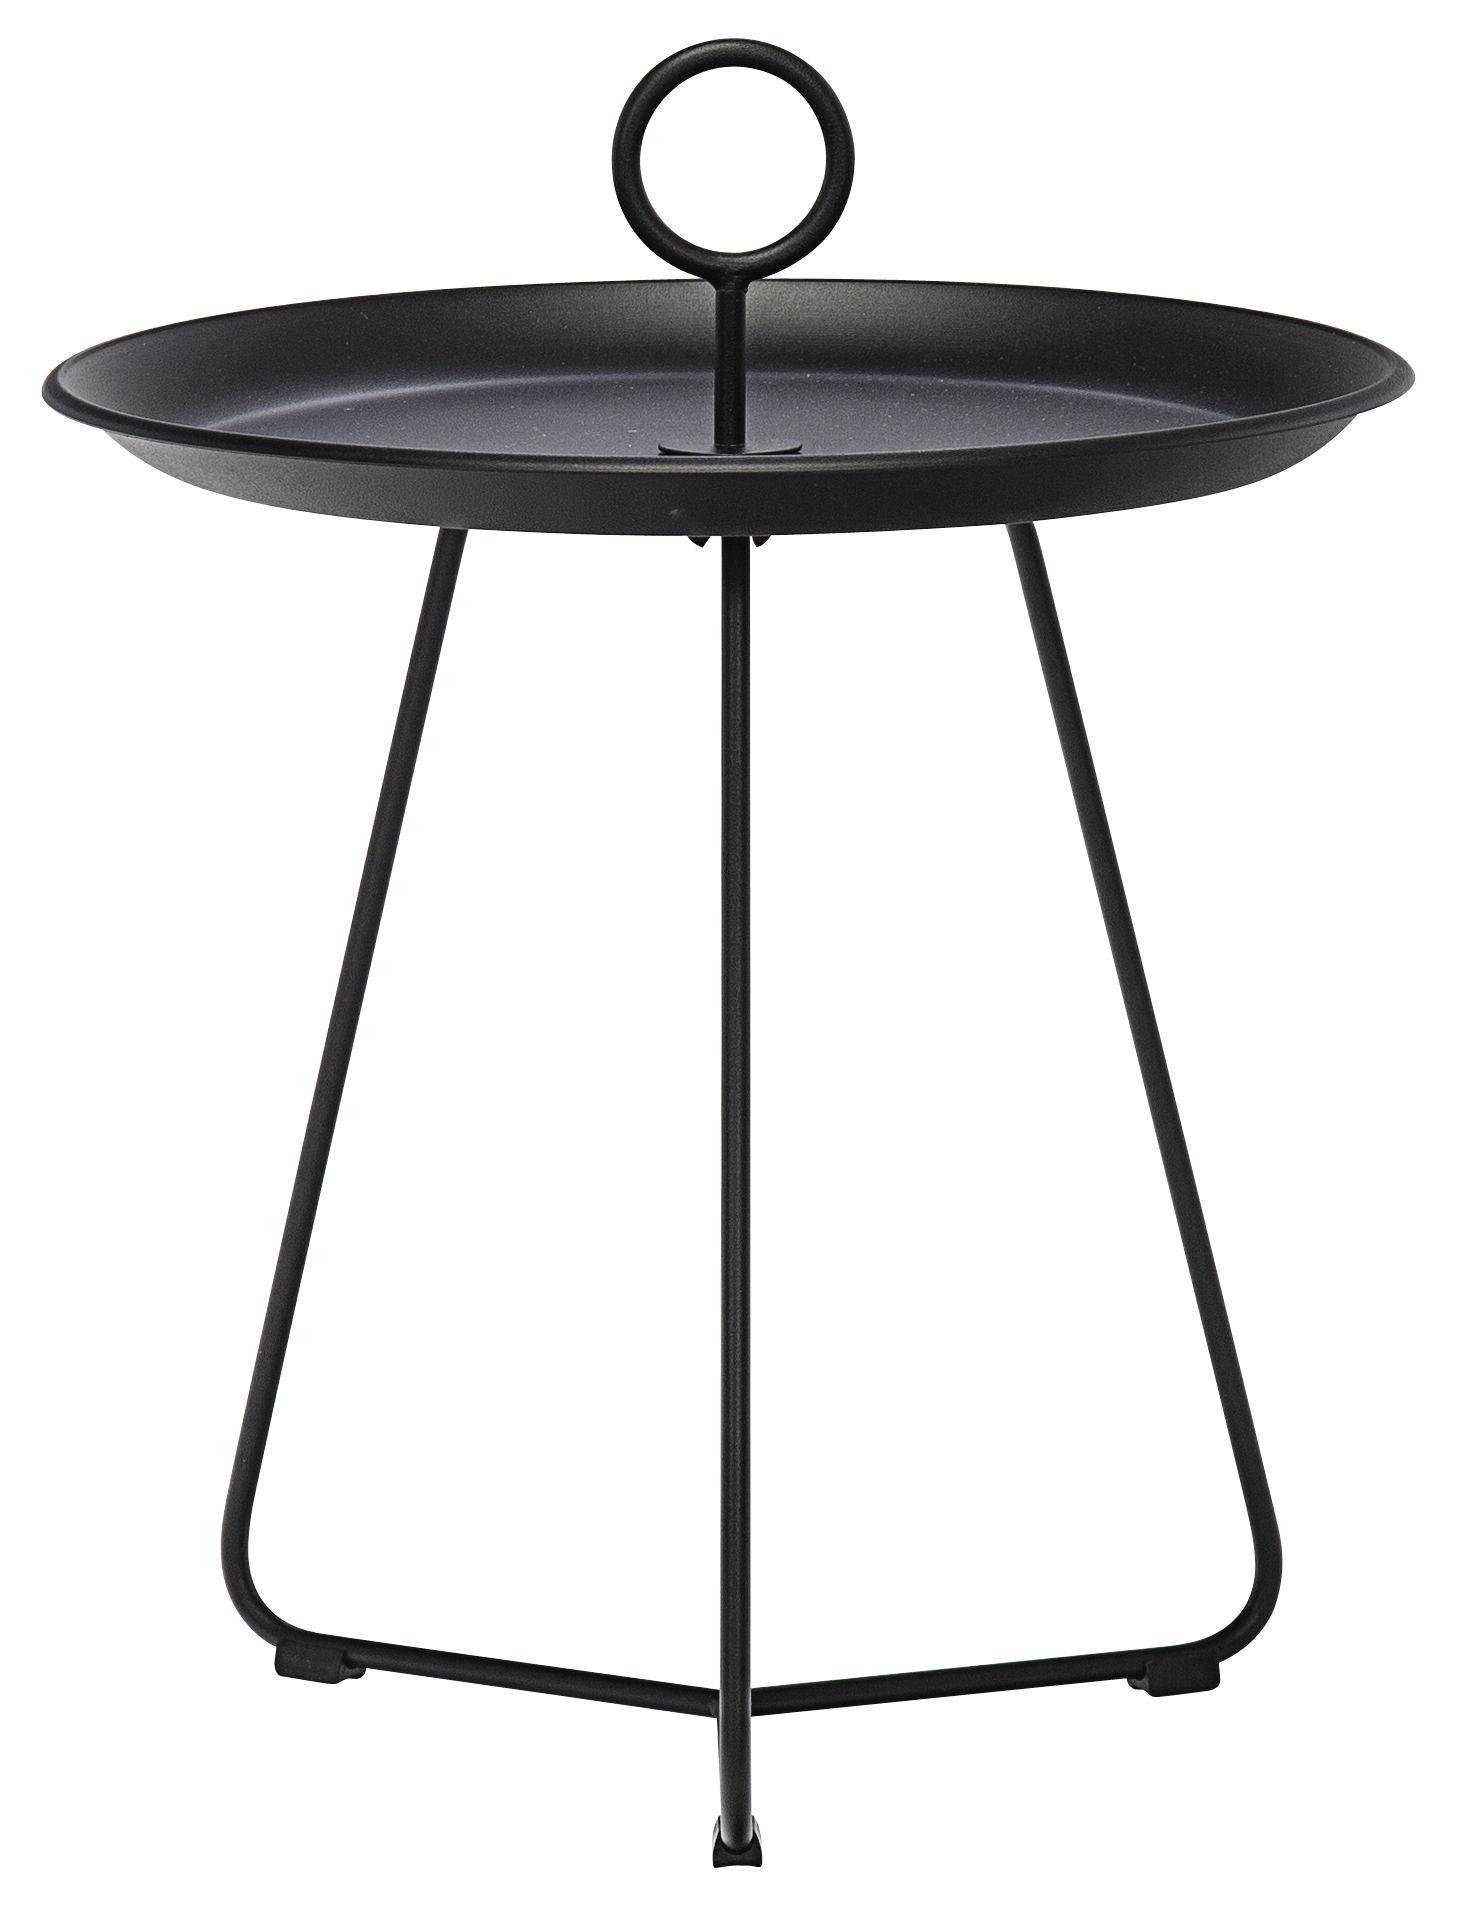 Mobilier - Tables basses - Table basse Eyelet Small / Ø 45 x H 46,5 cm - Houe - Noir - Métal laqué époxy